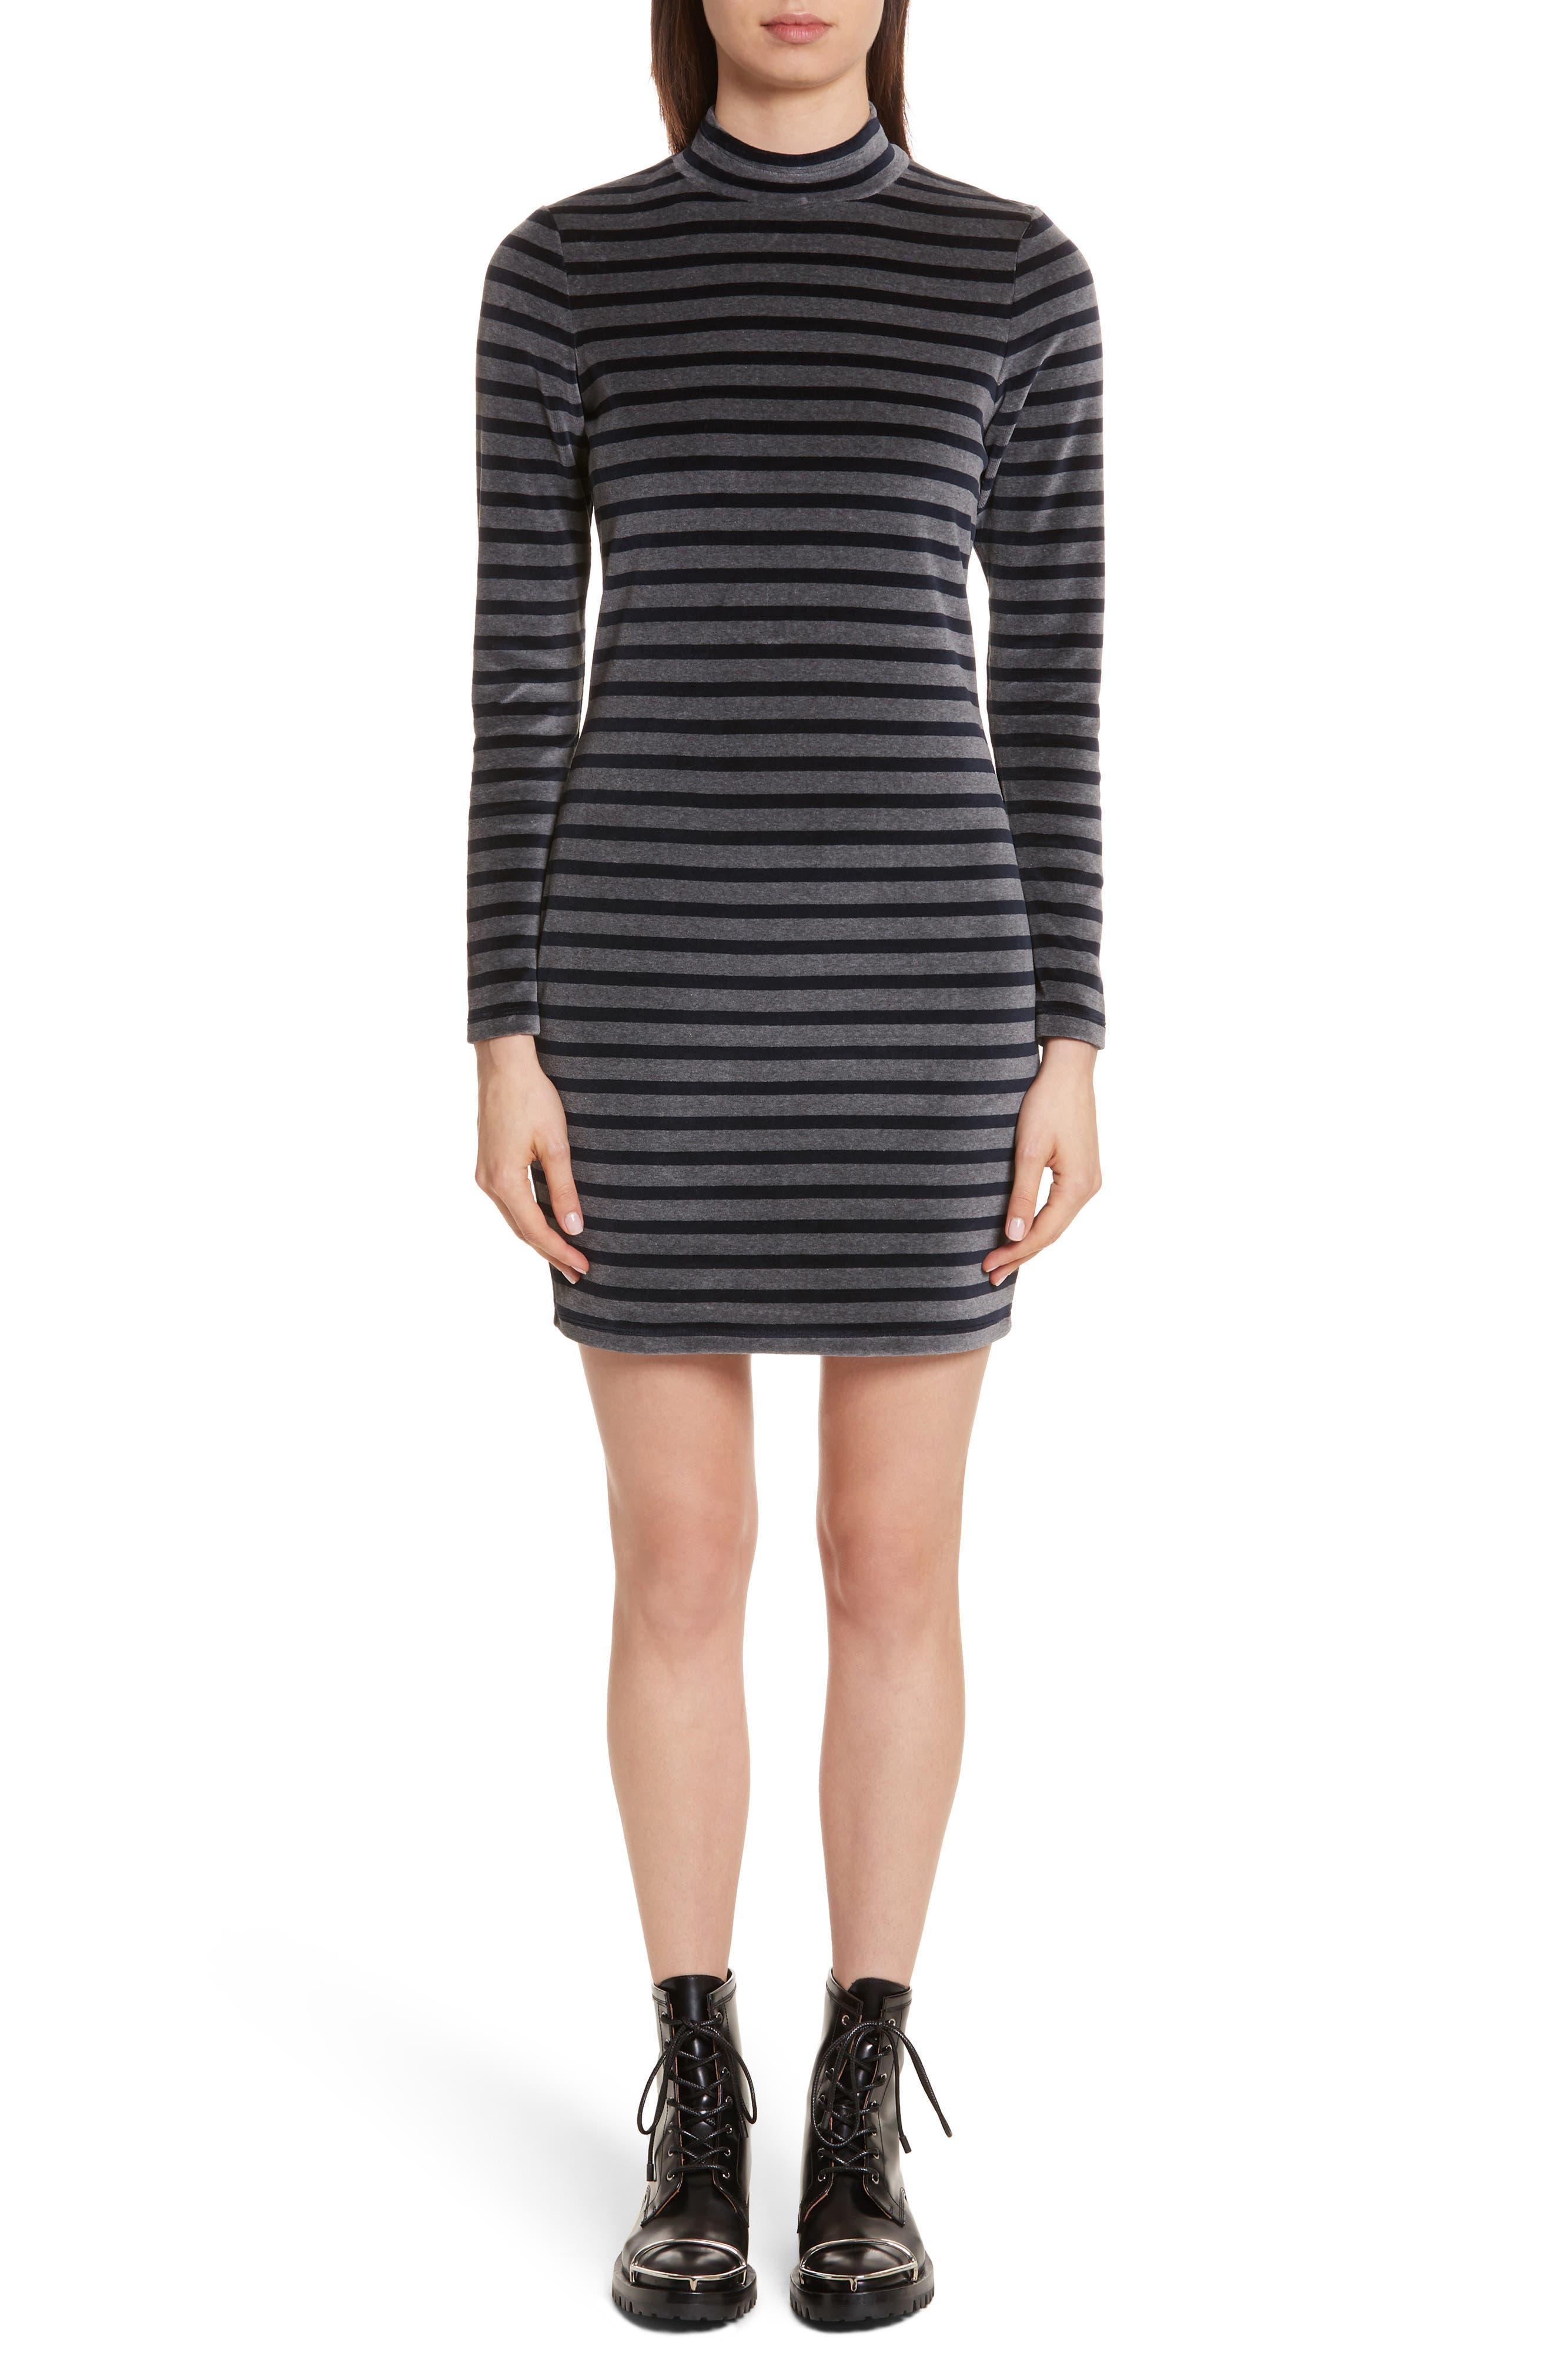 Stripe Velour Turtleneck Dress,                         Main,                         color, Charcoal With Navy Stripe